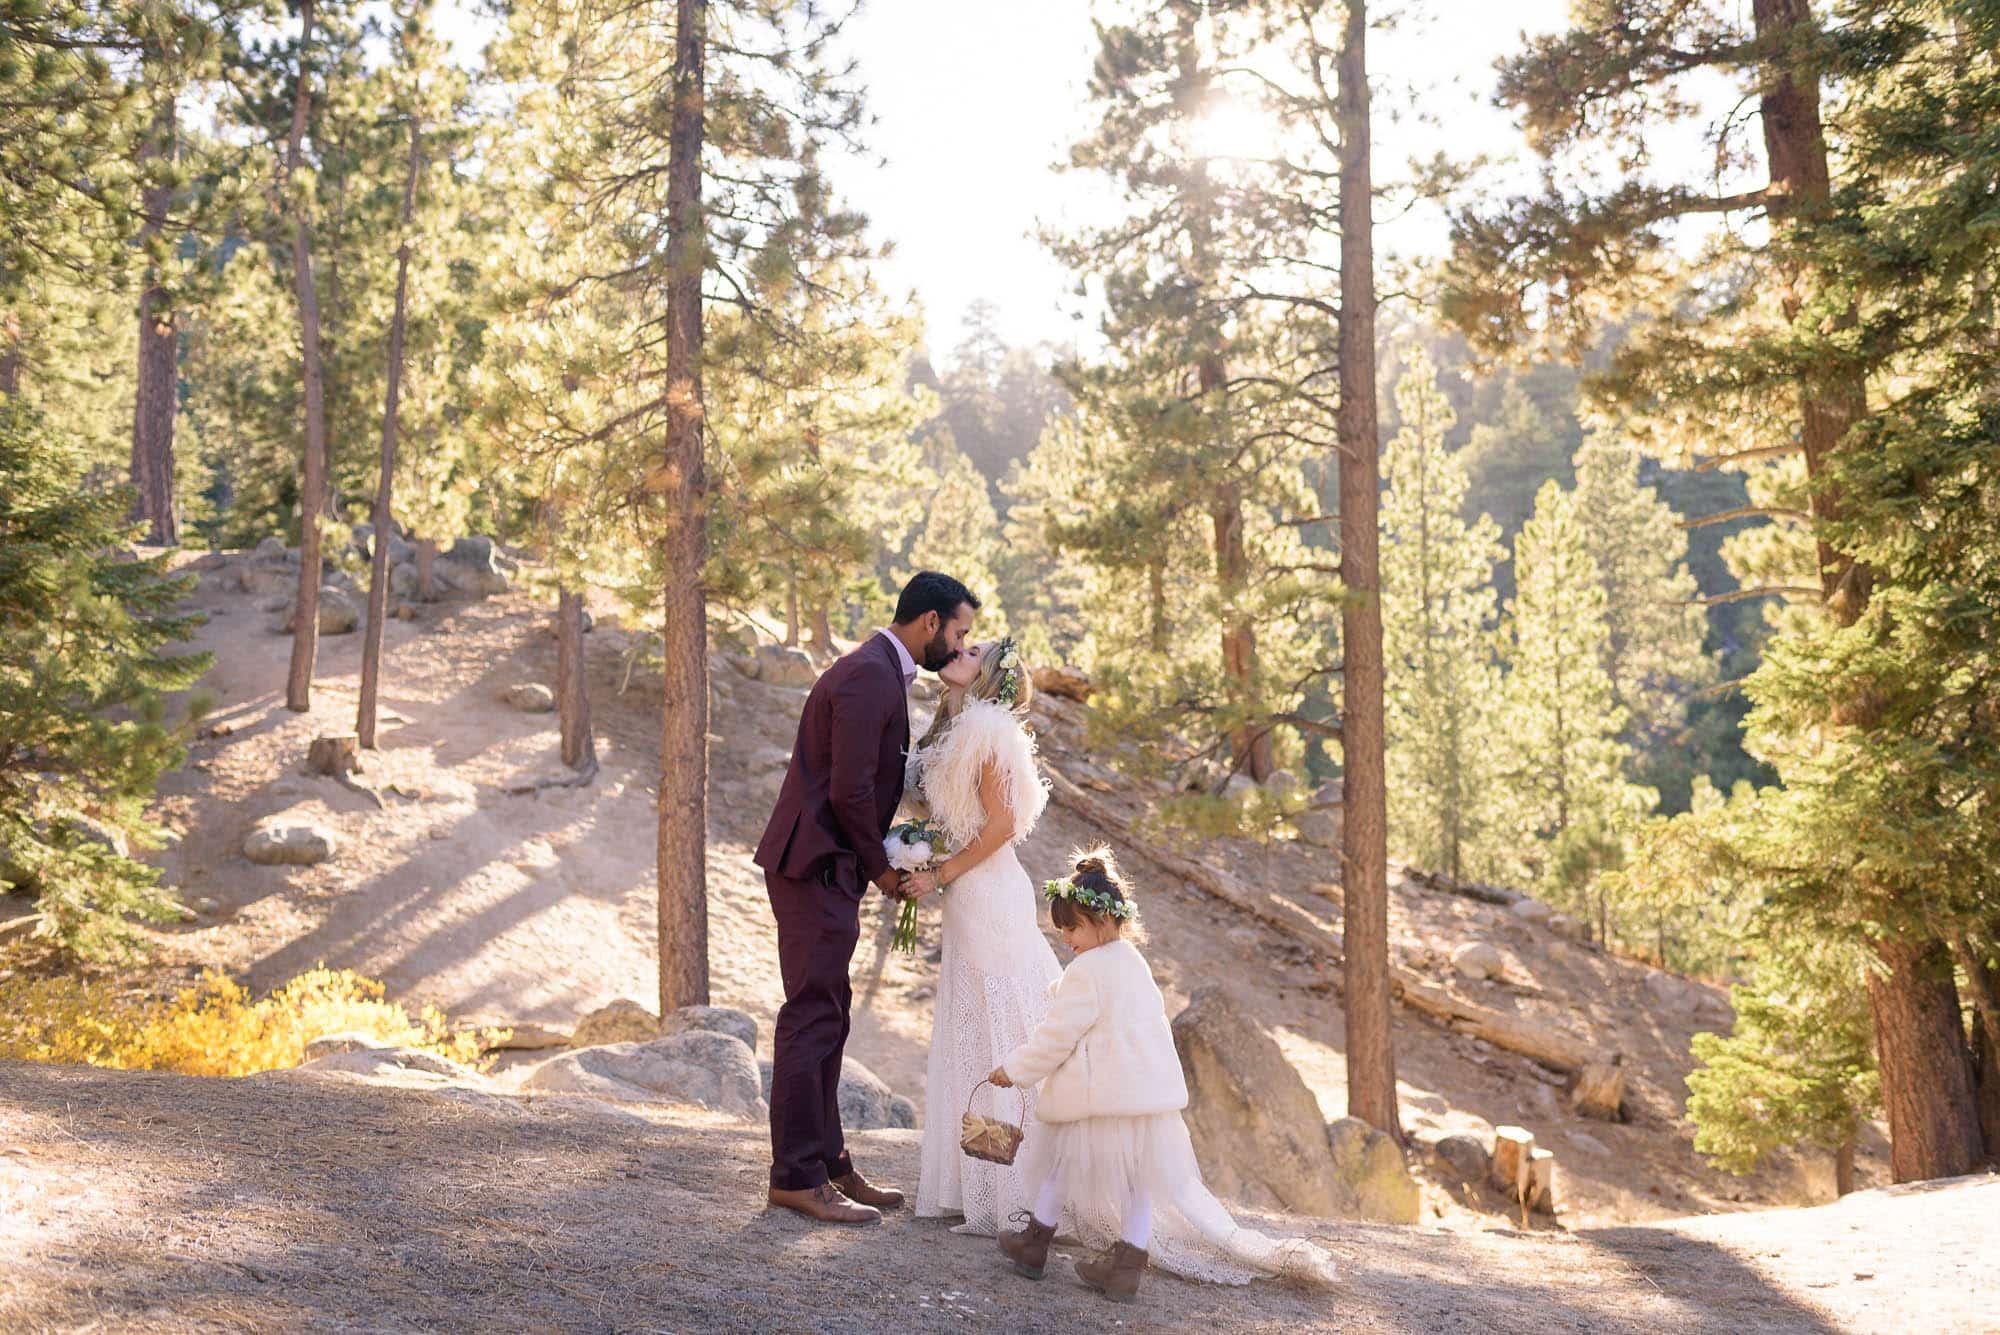 008_Alan_and_Heidi_Wedding_Natalie_Mike